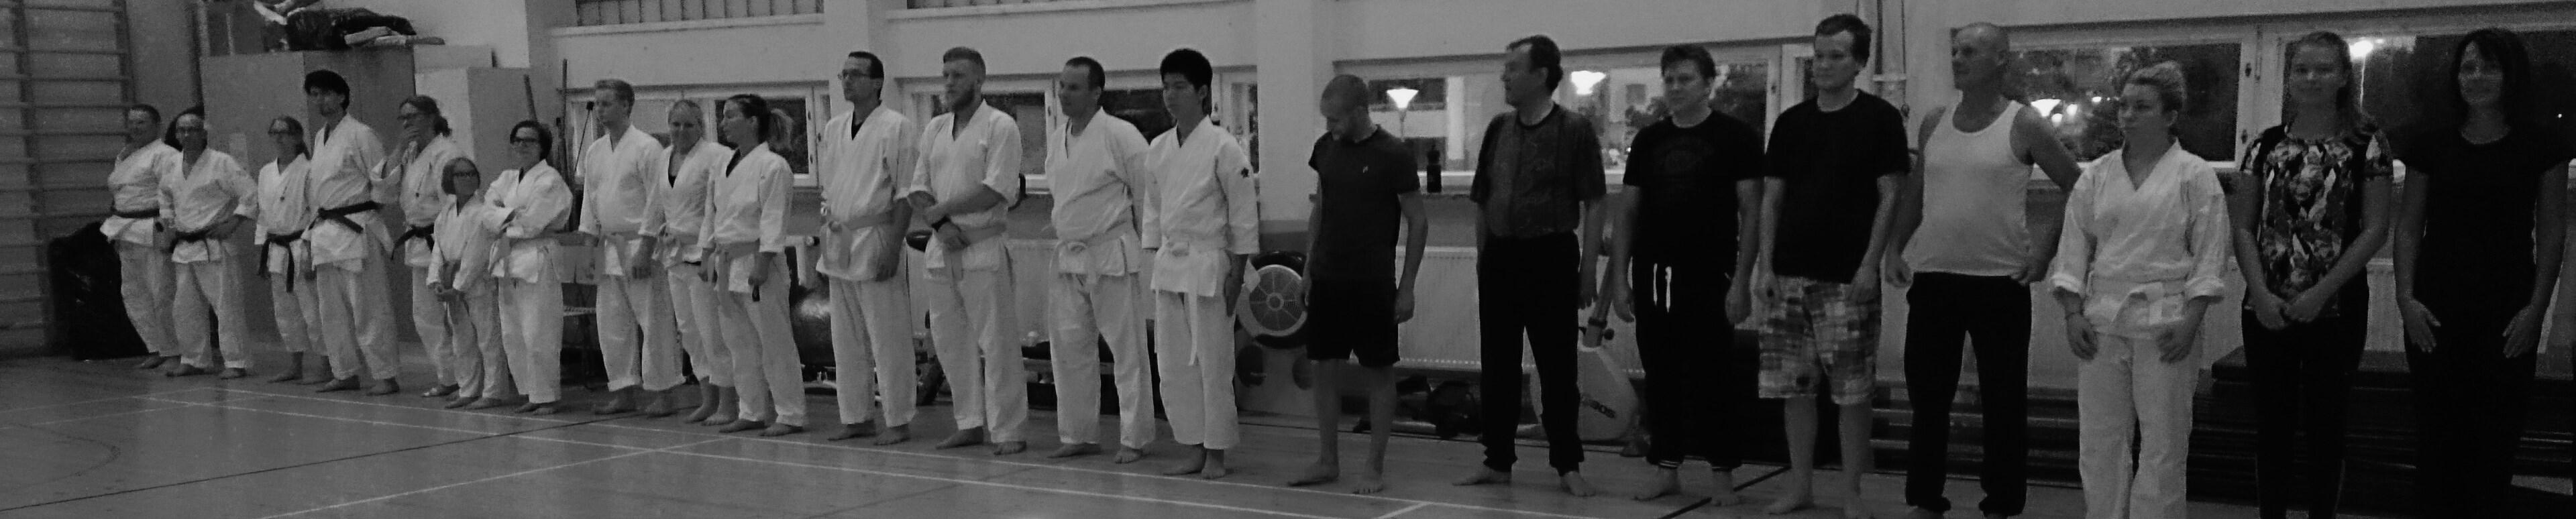 karategrupp3